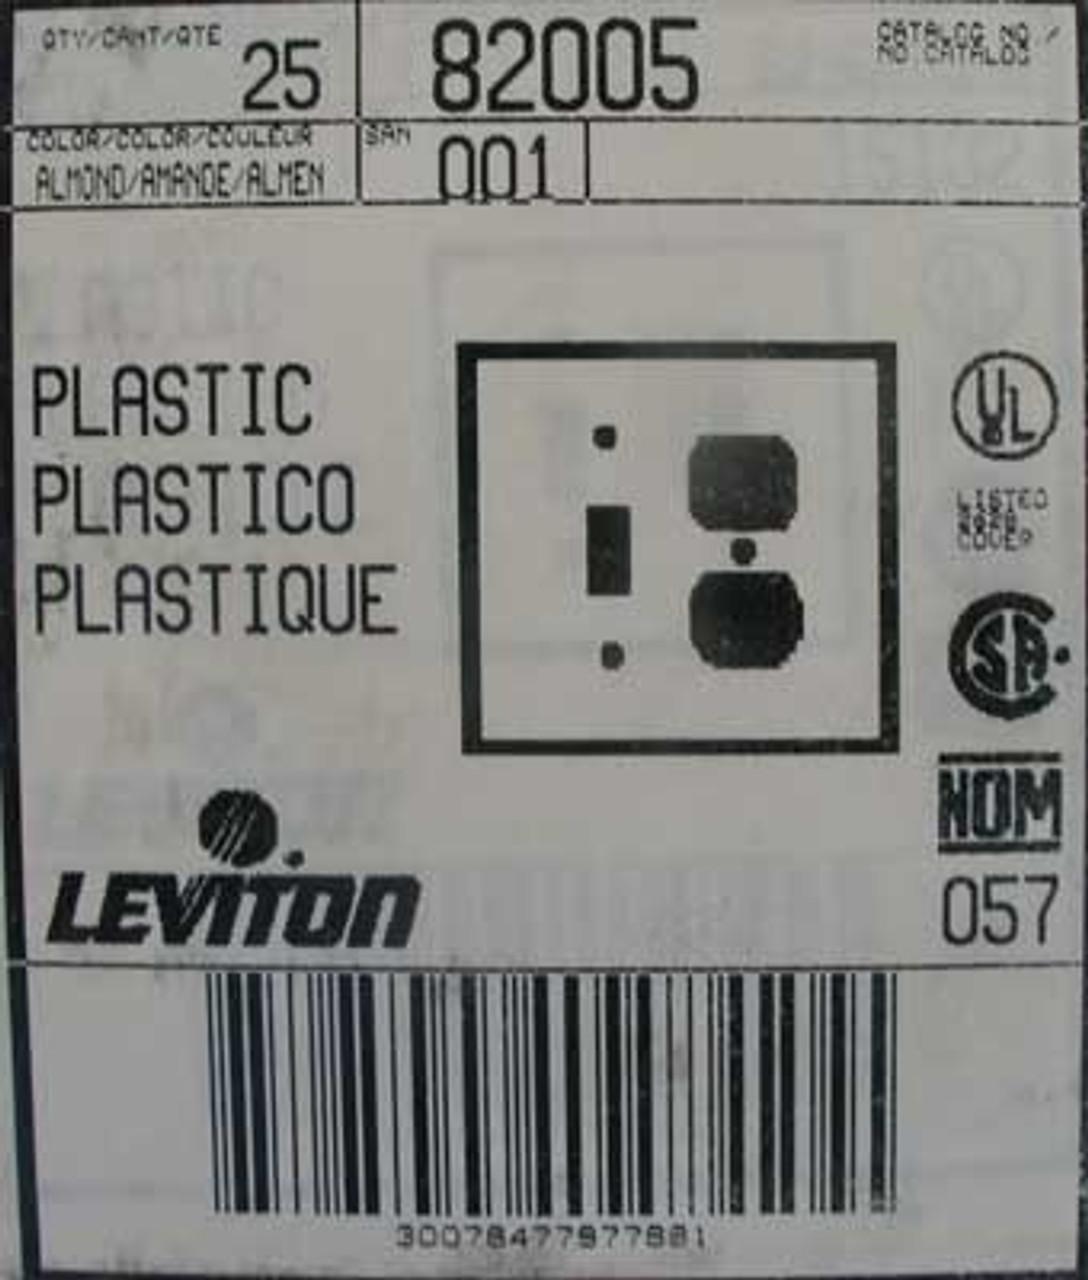 Leviton 82005 2 Gang 1 Toggle 1 Duplex Wallplate (Lot of 25)